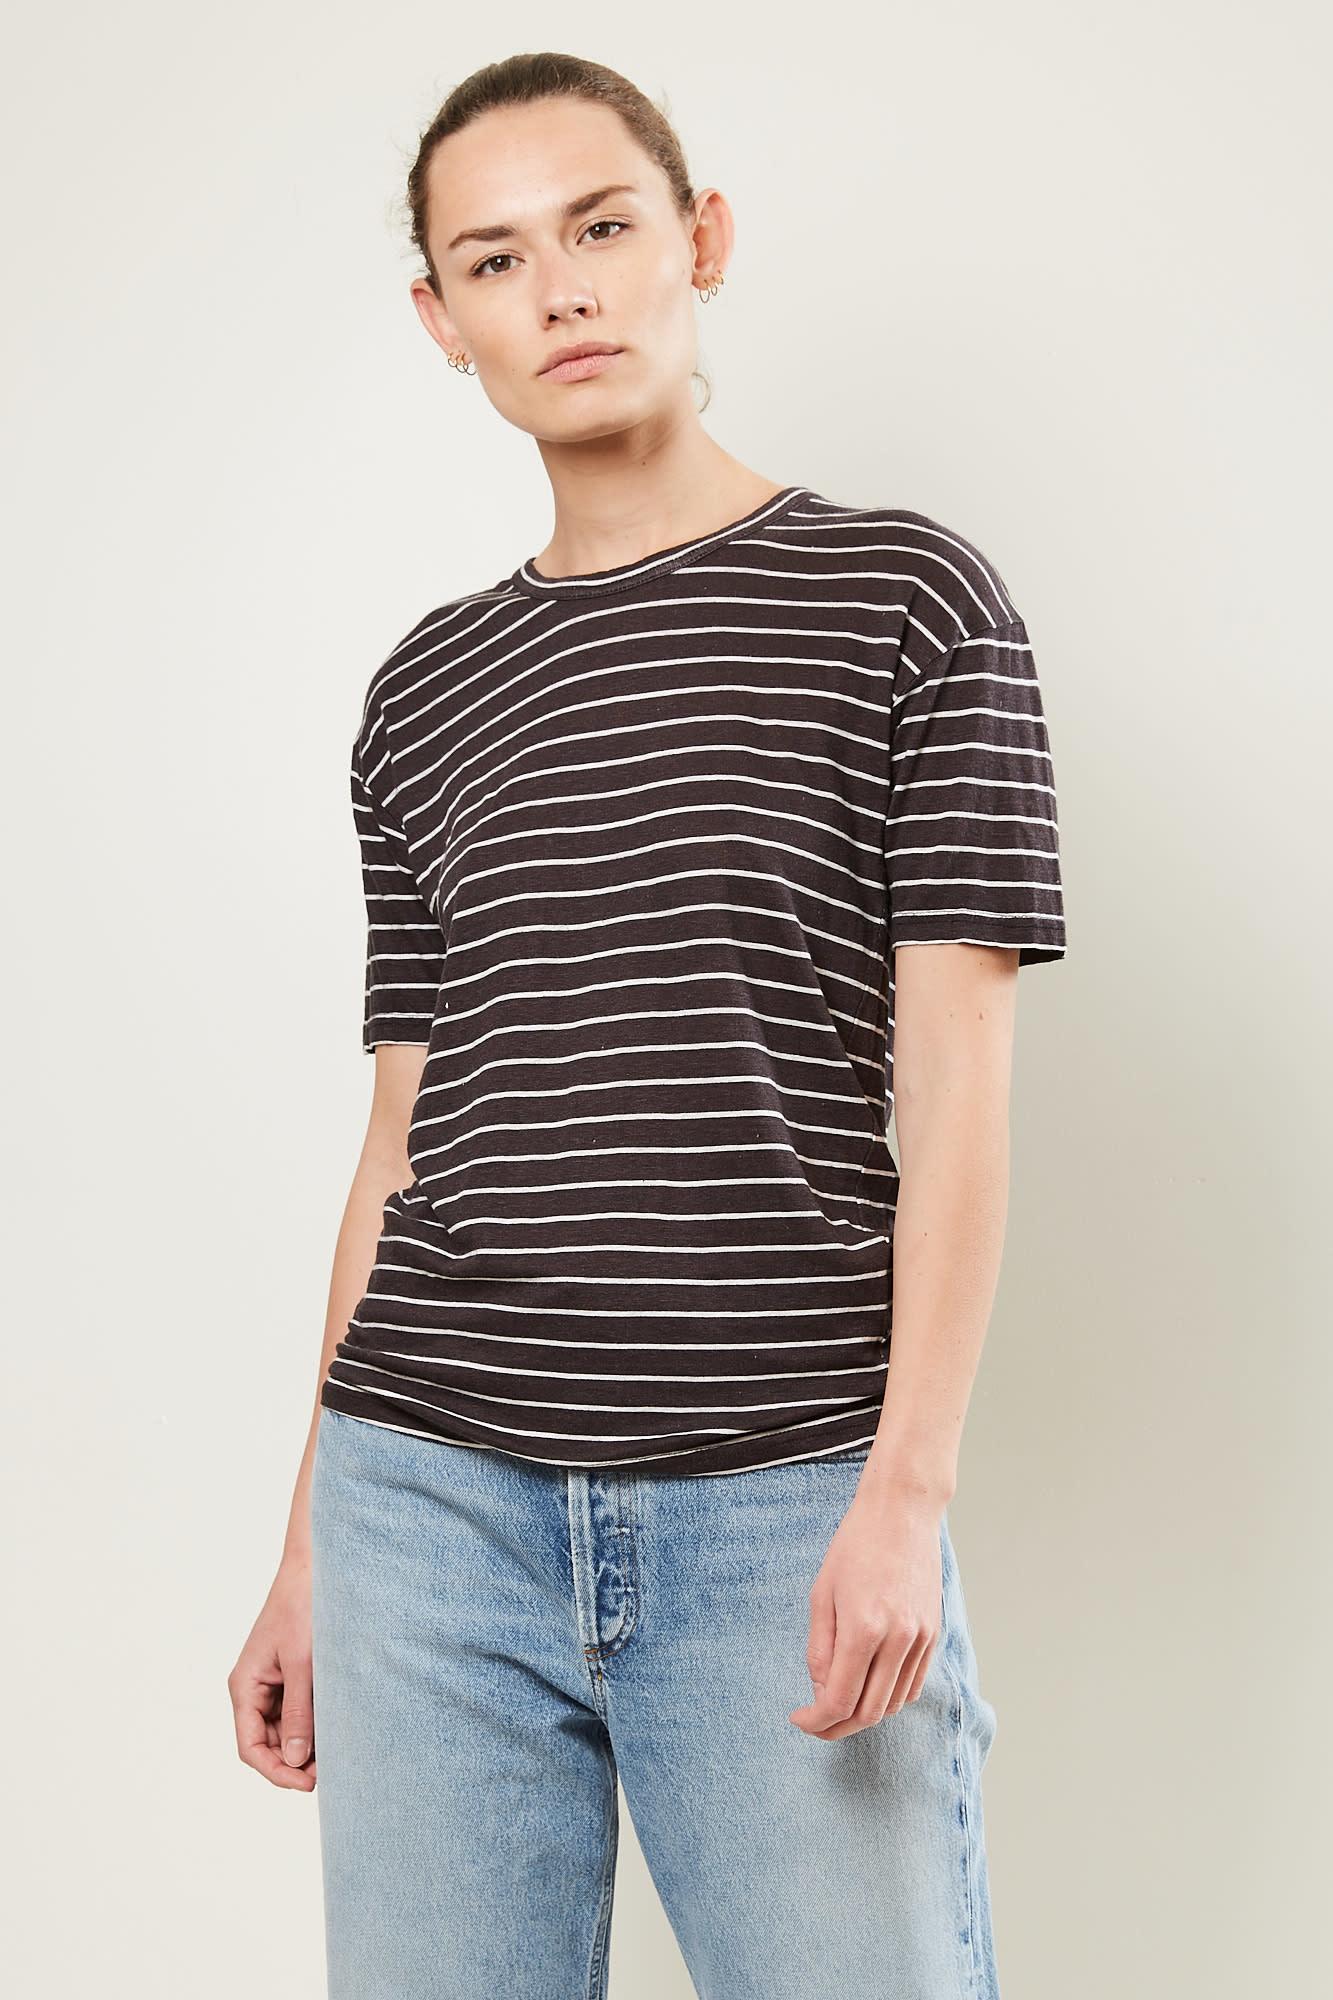 Etoile Isabel Marant - ken tee shirt